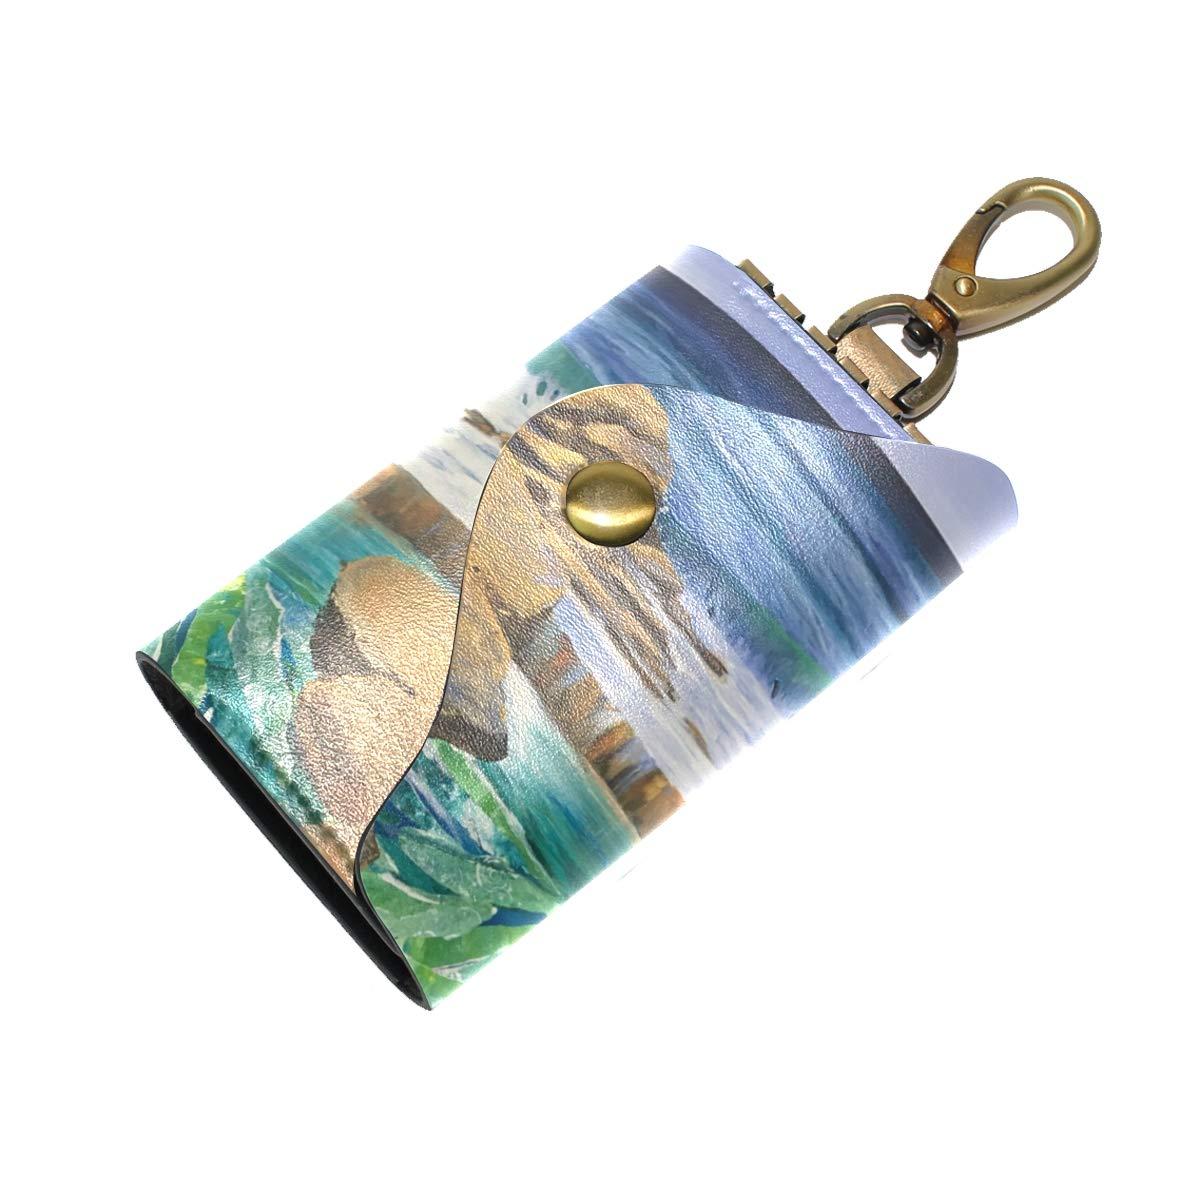 KEAKIA Sea Art Leather Key Case Wallets Tri-fold Key Holder Keychains with 6 Hooks 2 Slot Snap Closure for Men Women